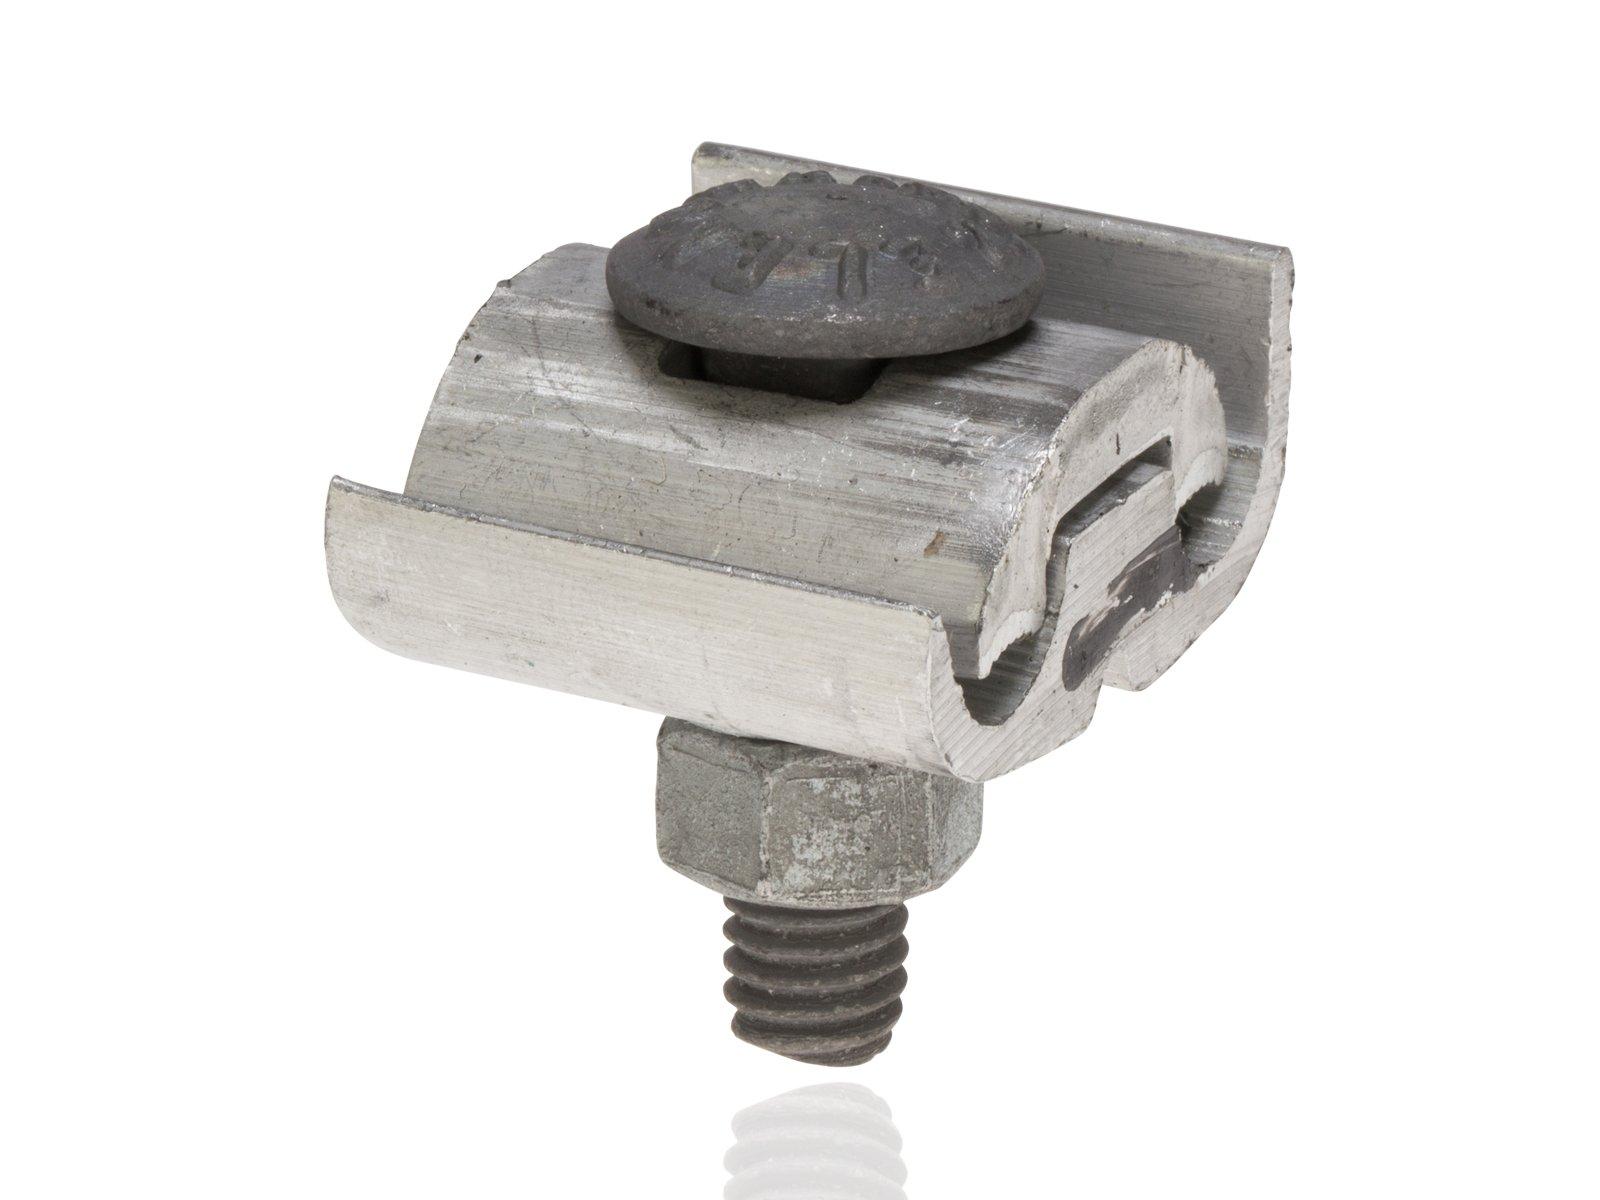 Utility Connector, One and Two Bolt Aluminum Parallel Groove Clamps, 1/0-8 Main ACSR, 2/0 str-8 sol Main AL/CU, 1/0-8 Tap ACSR, 2/0 str-8 sol Tap AL/CU, 3/8'' Length